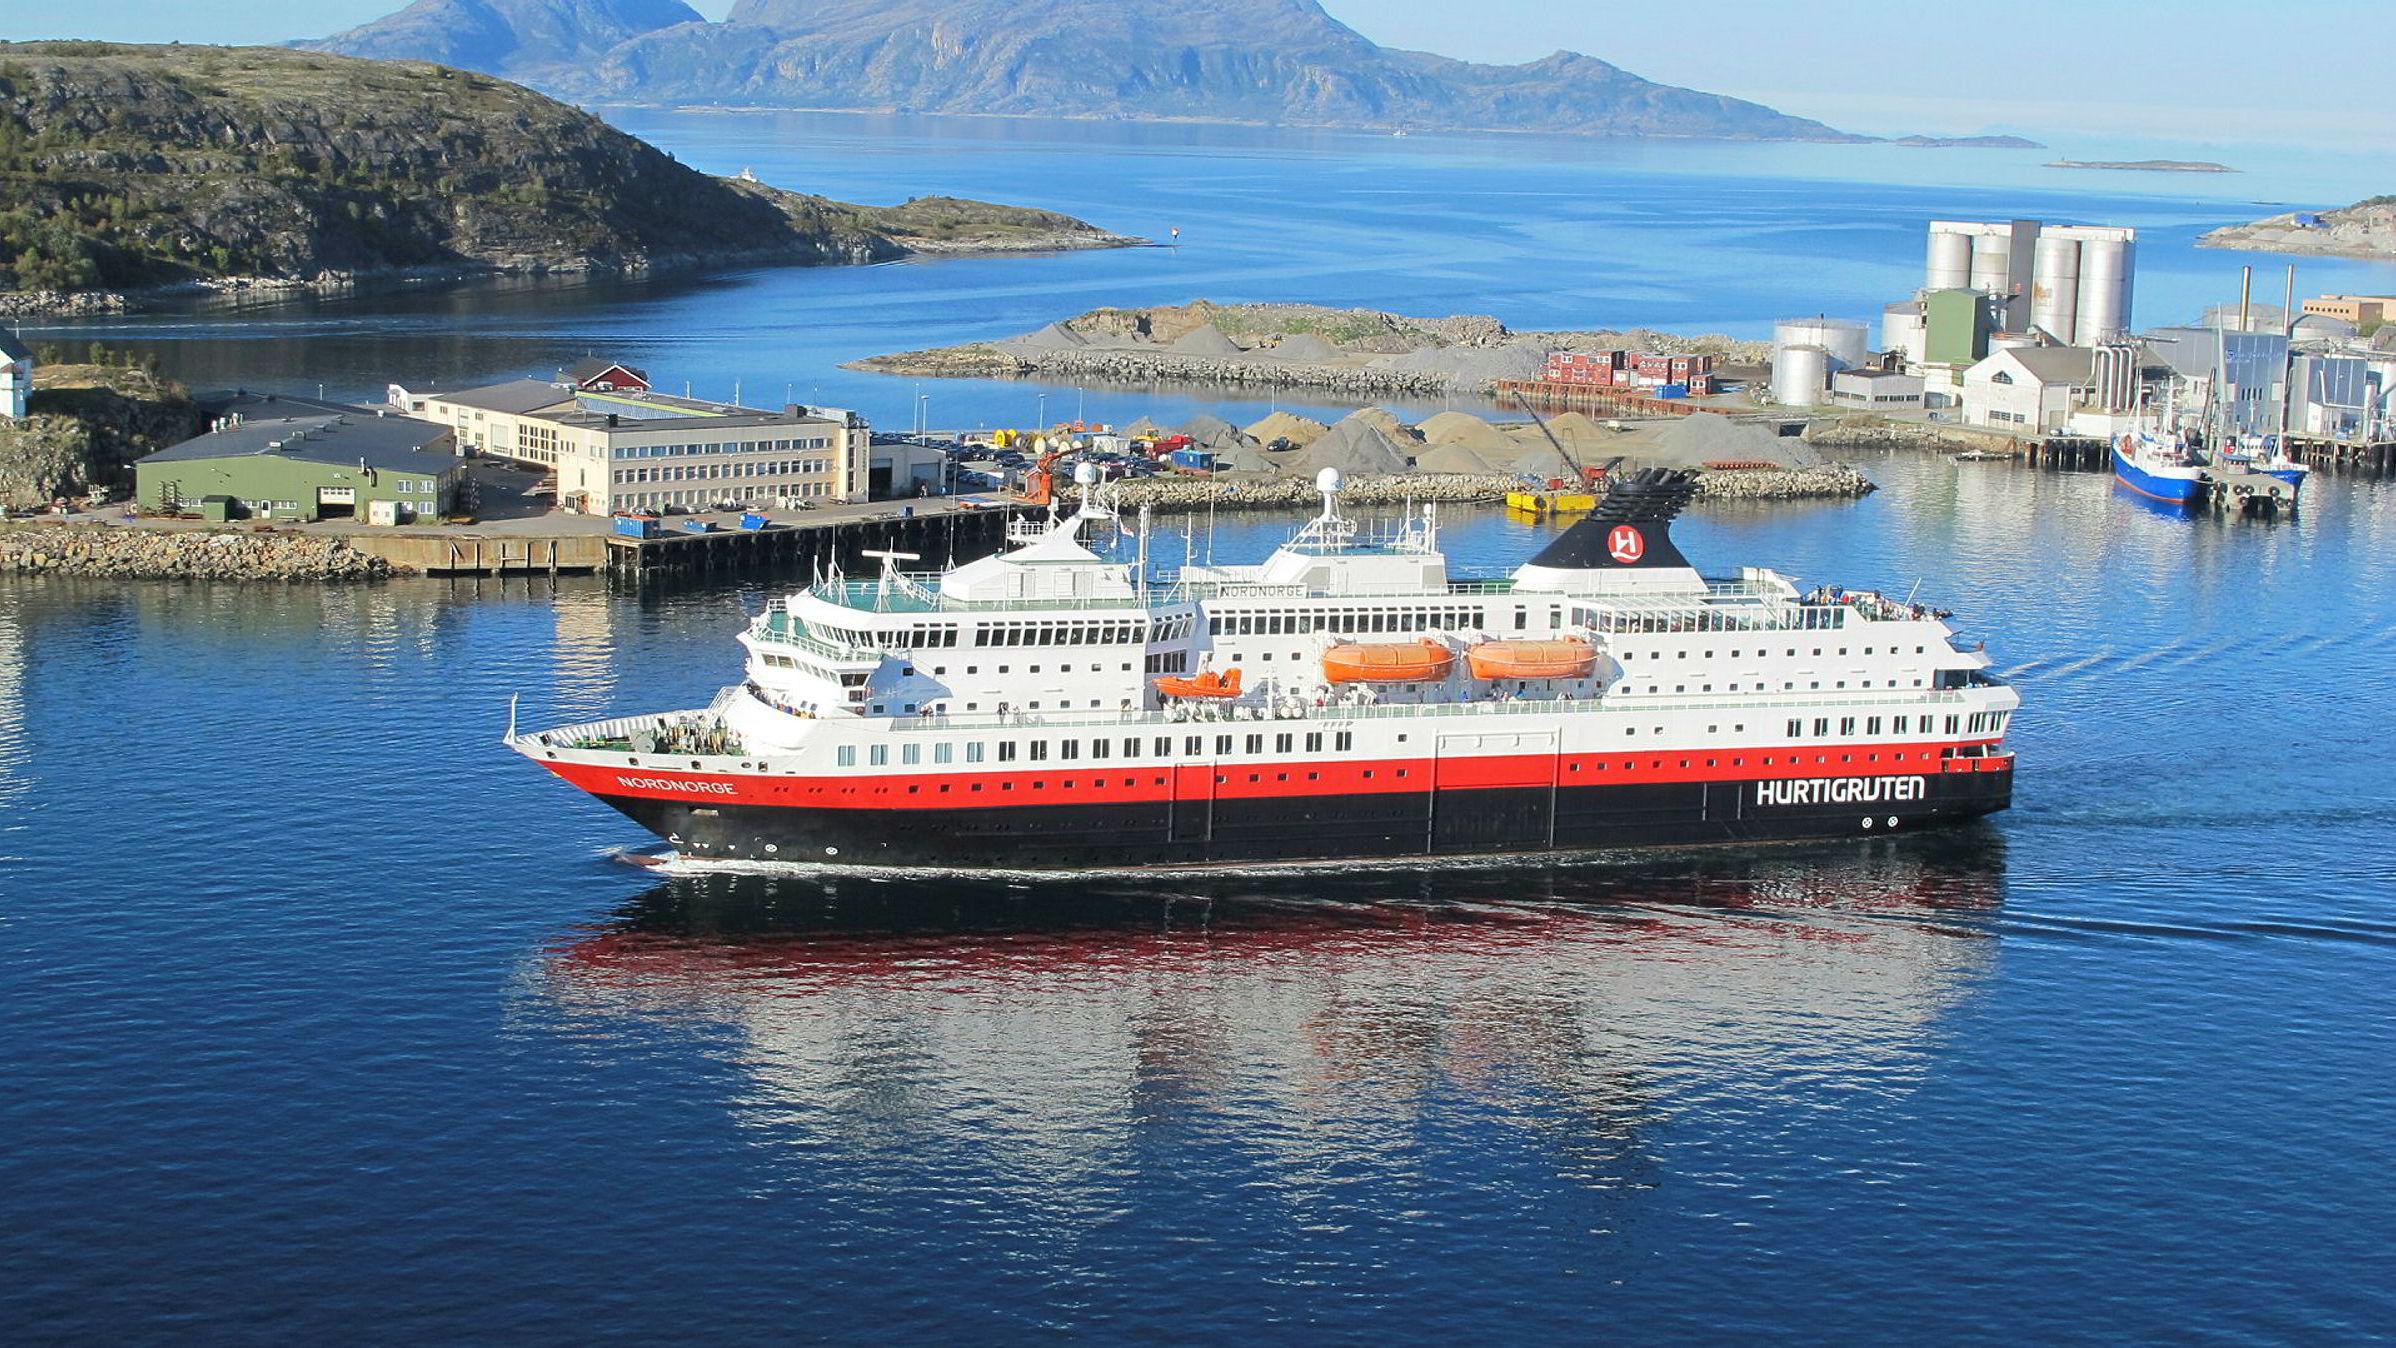 Hurtigruteskipet NordNorge på vei ut fra Bodø havn.